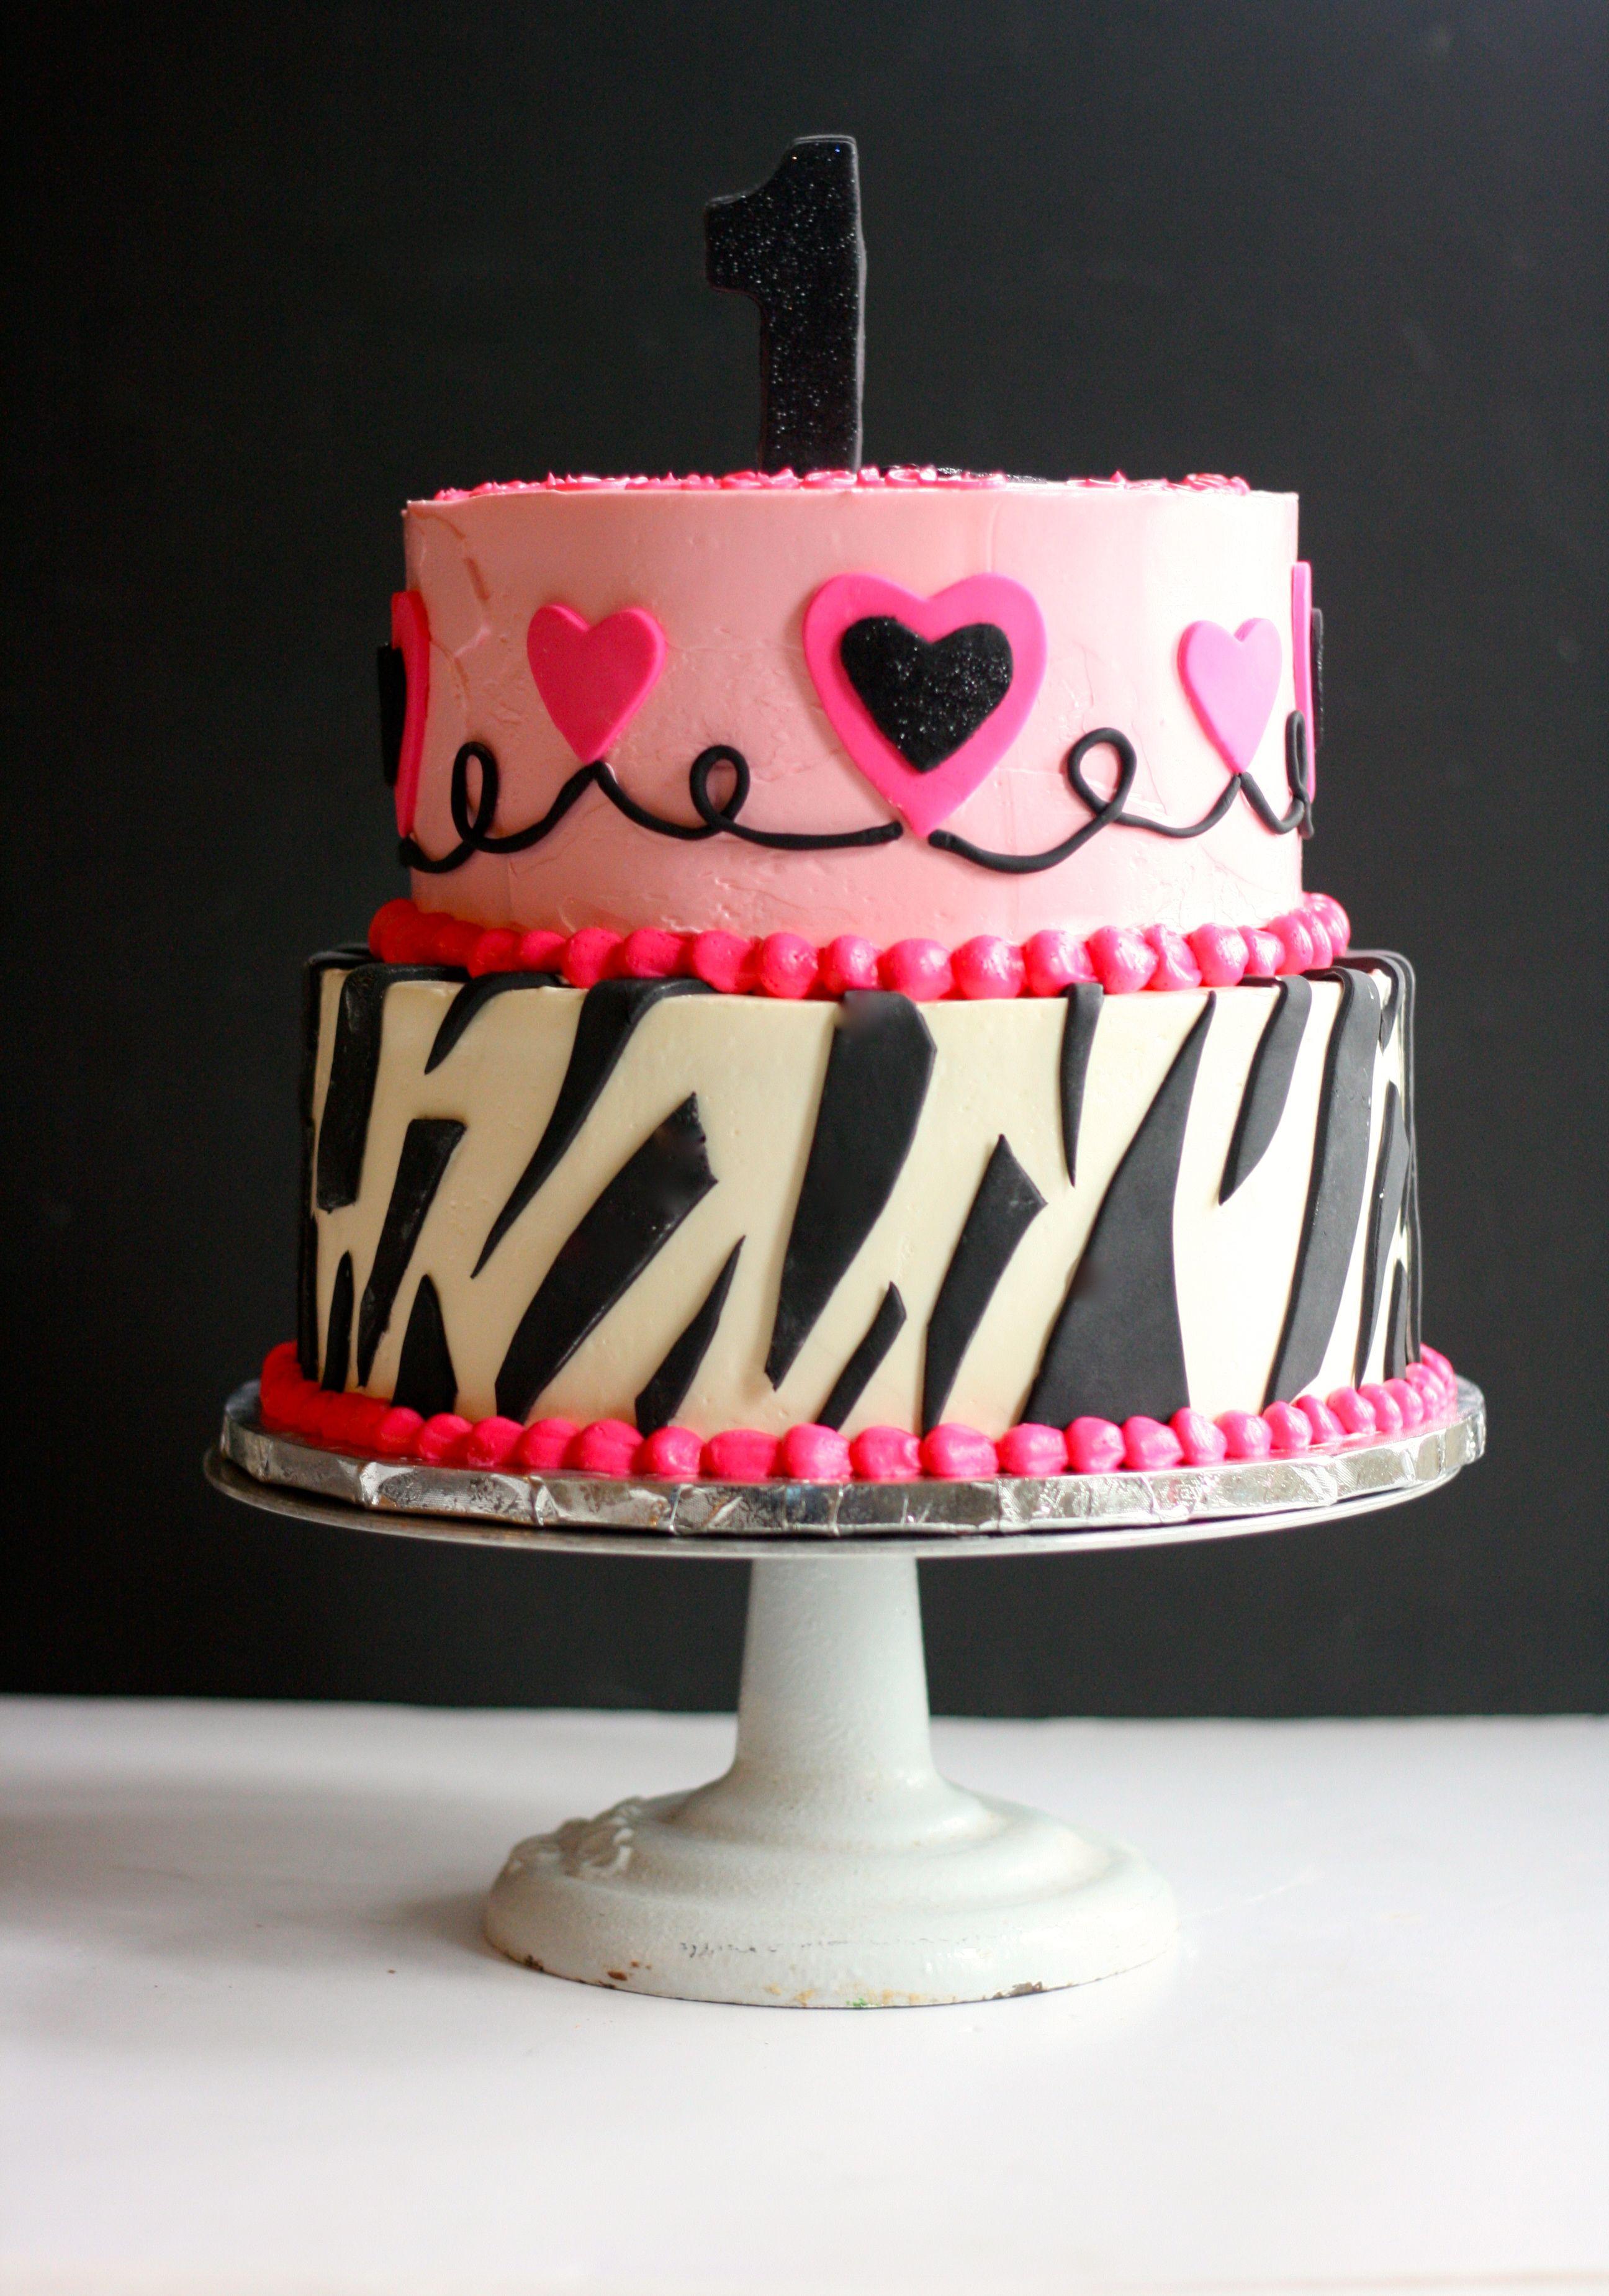 Little Diva Birthday Cake GoodieBox Bakeshop Hoboken NJ